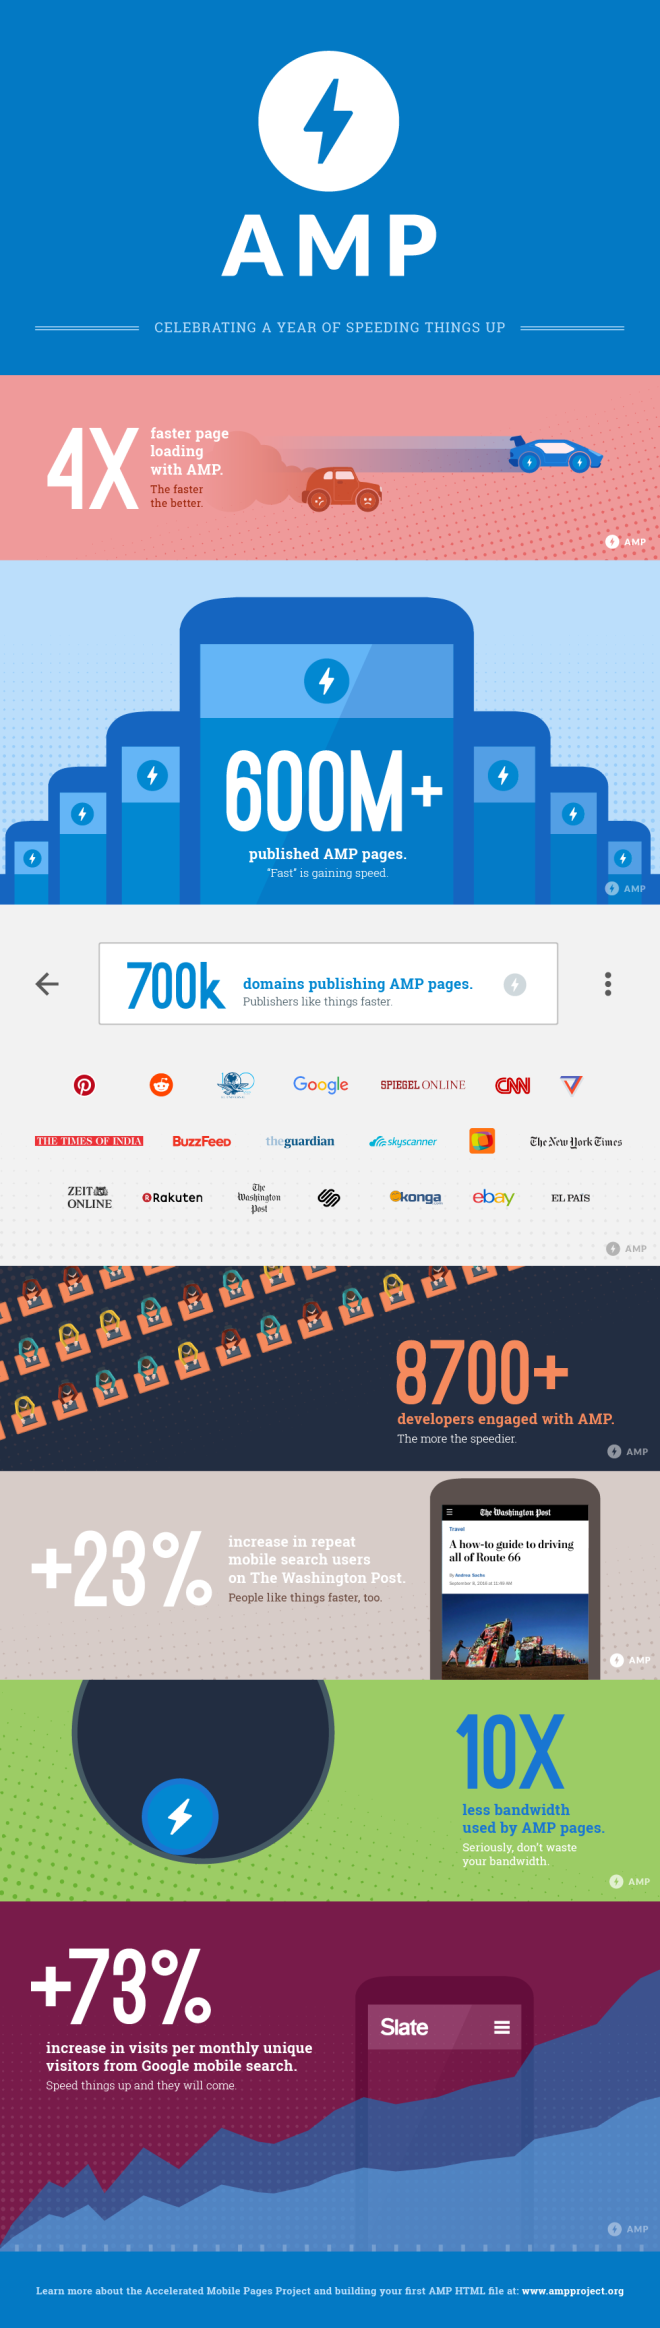 infographie amp